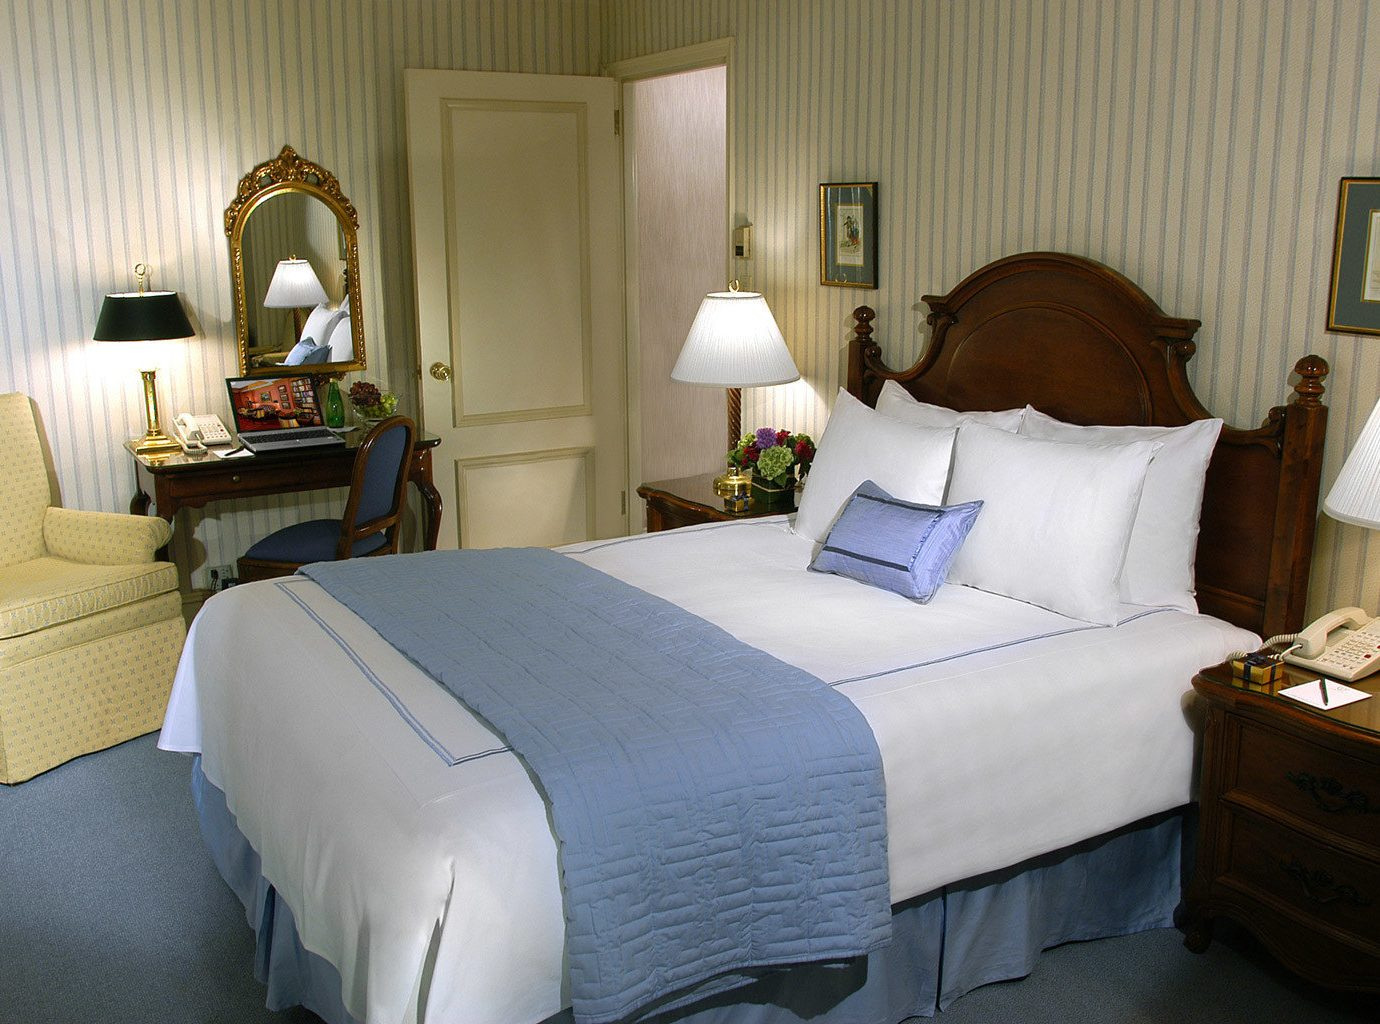 Bedroom Elegant Luxury Suite sofa property cottage home living room bed sheet pillow lamp